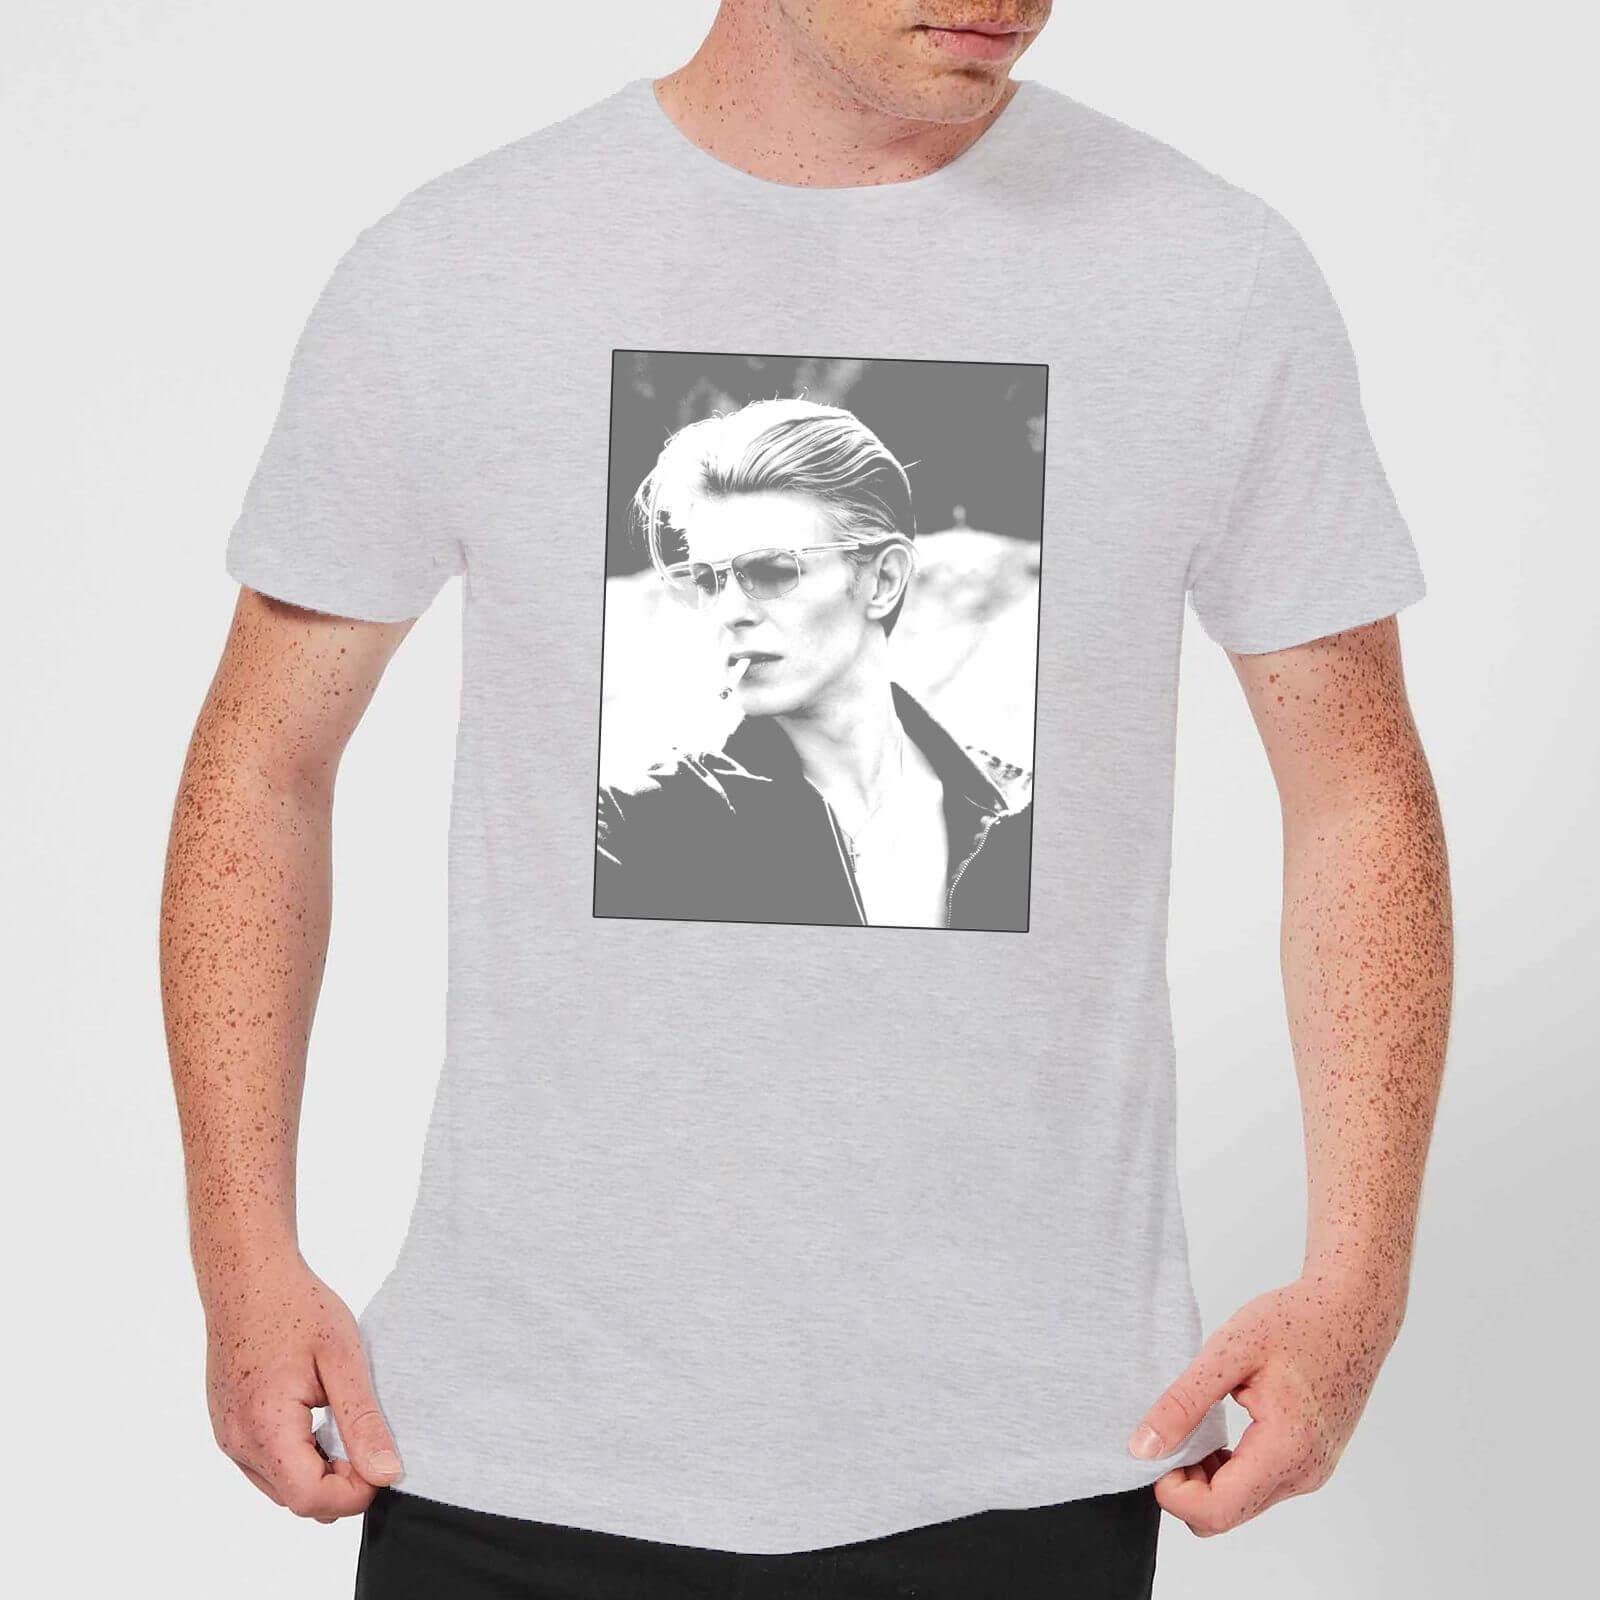 David Bowie Wild Profile Framed Men's T-Shirt - Grey - XL - Grey